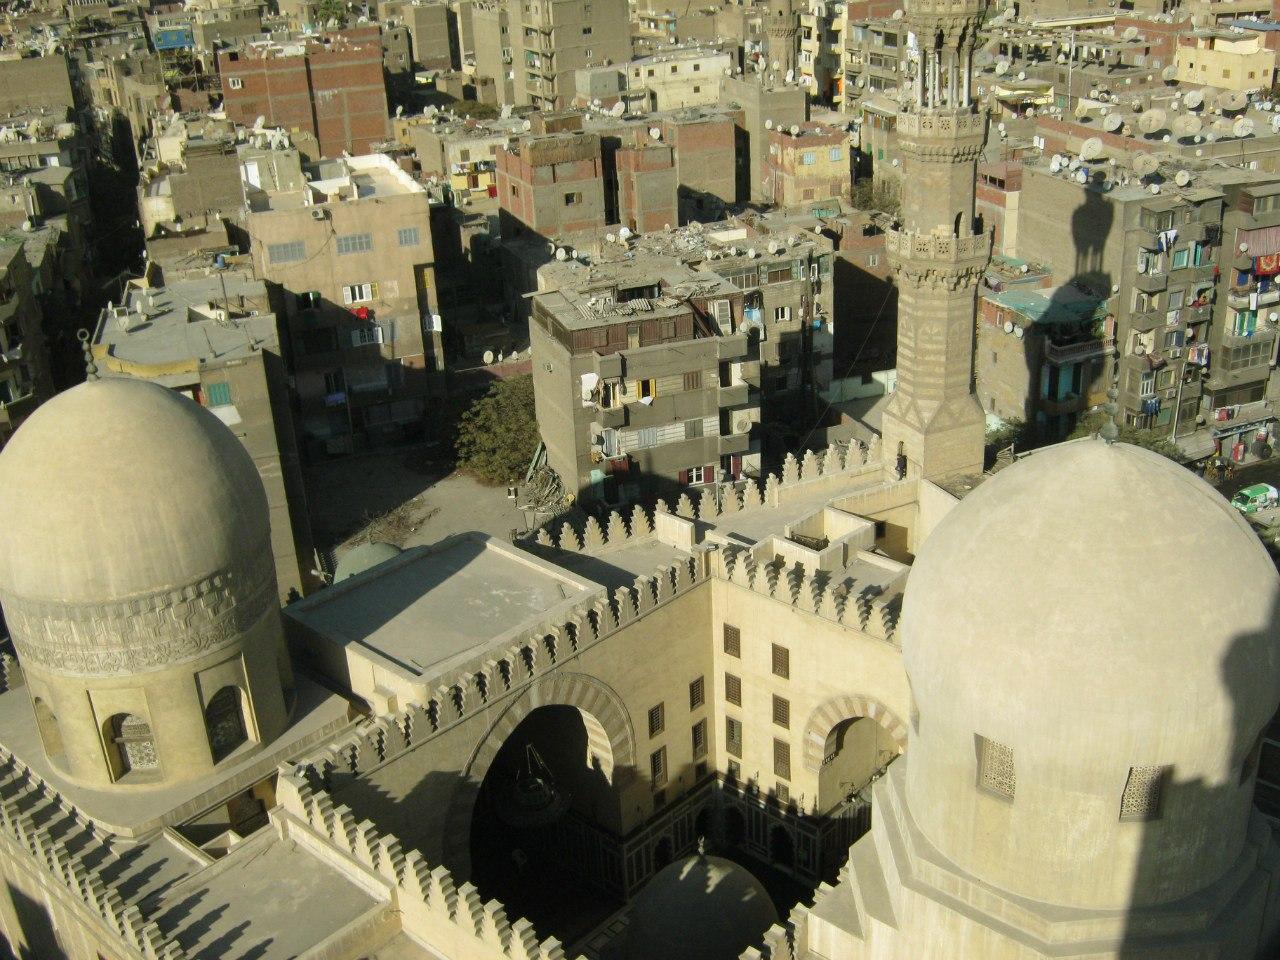 с минарета мечети Ахмед ибн Тулун